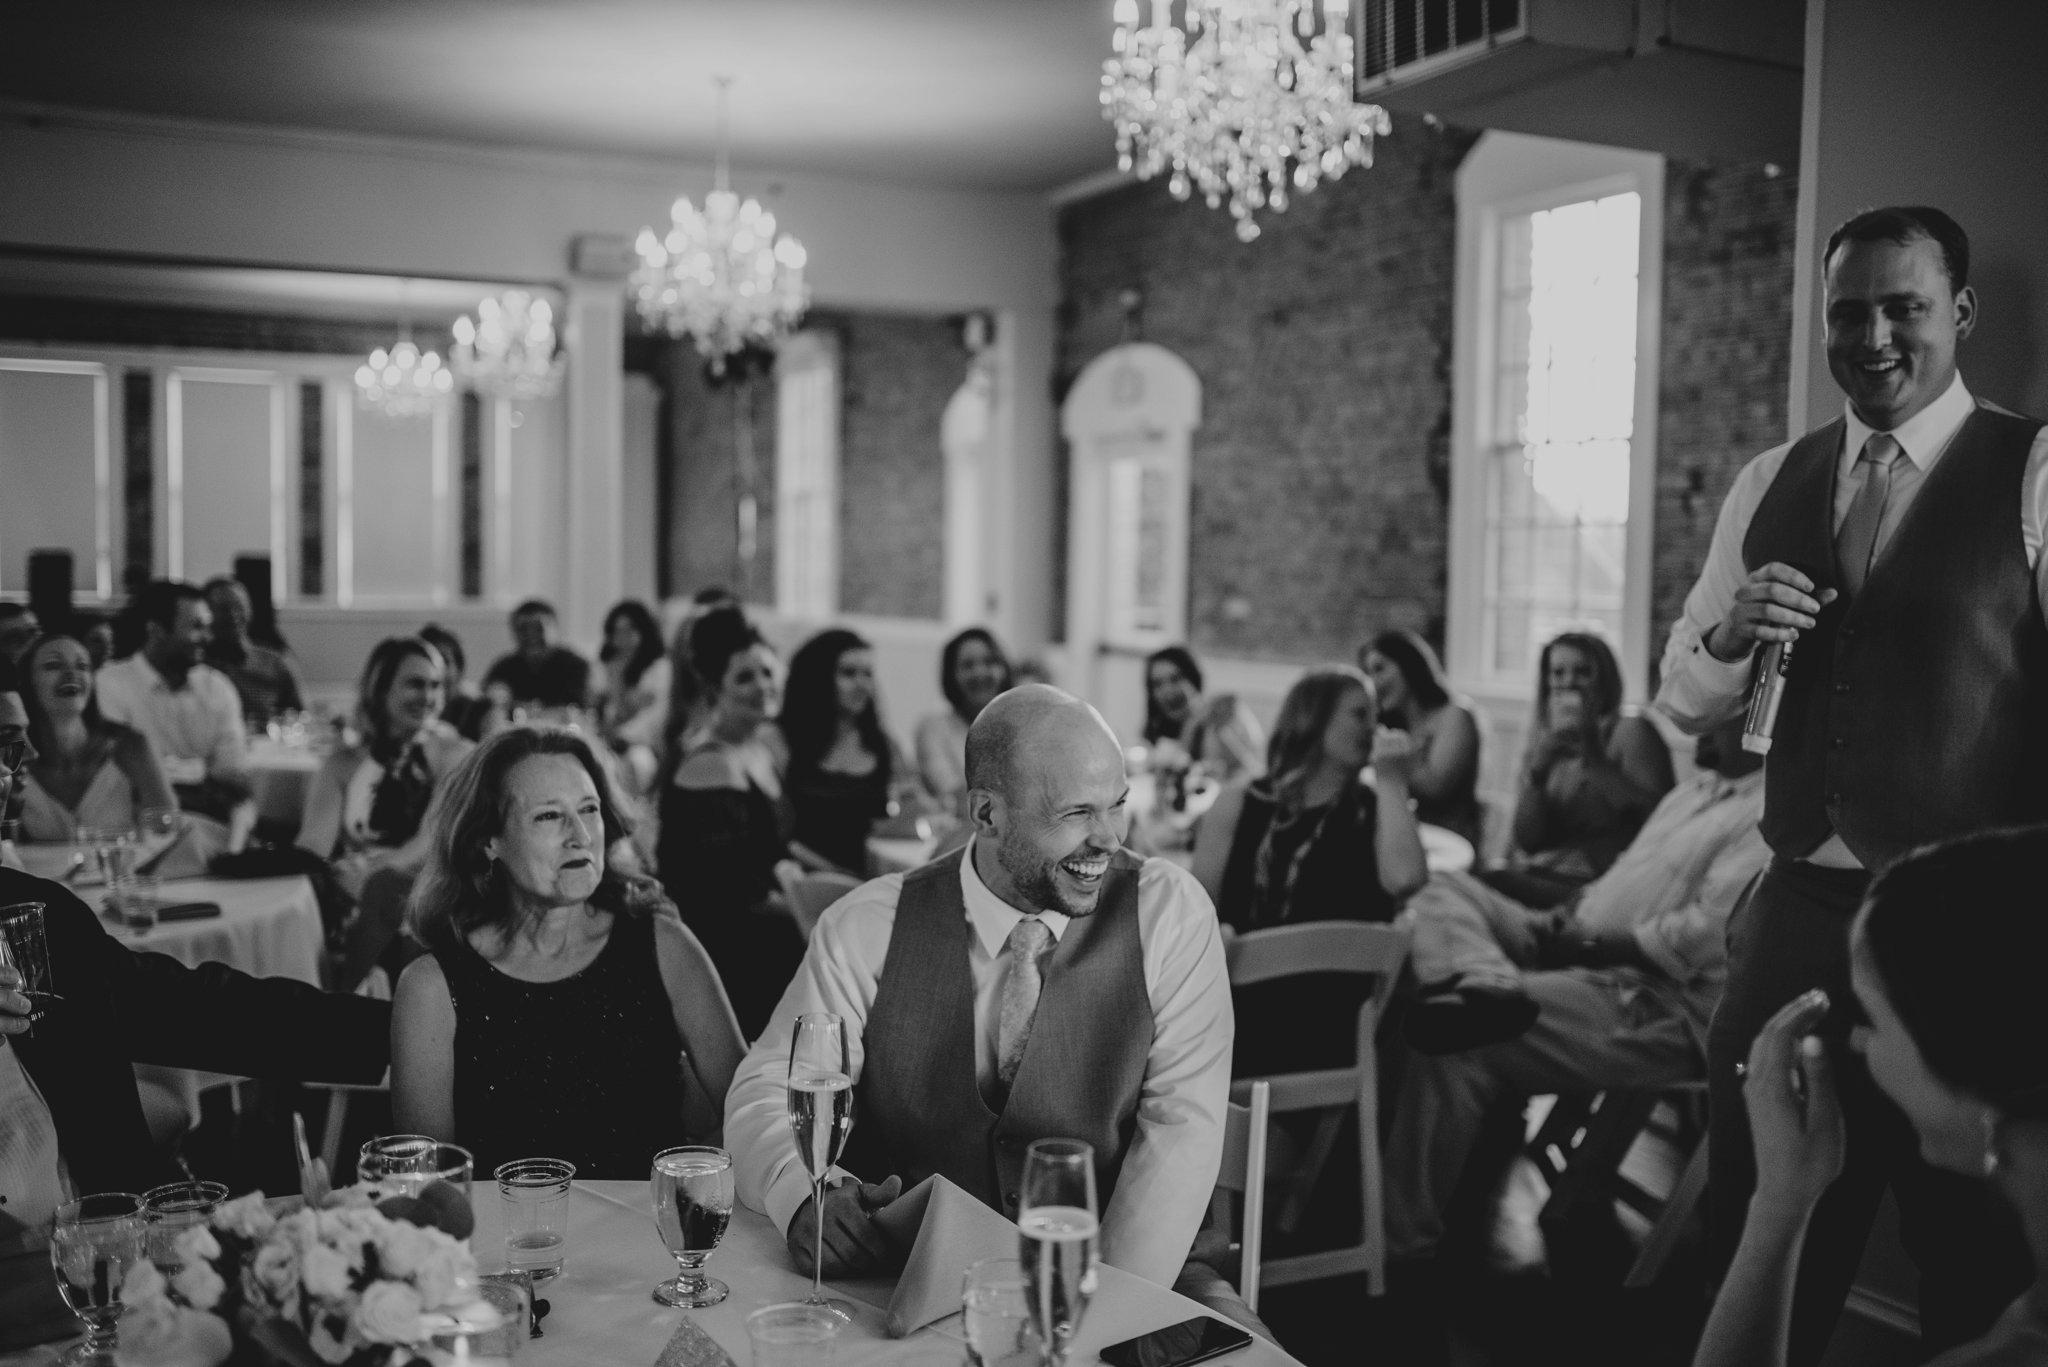 hollywood-school-house-wedding-seattle-photographer-caitlyn-nikula-103.jpg